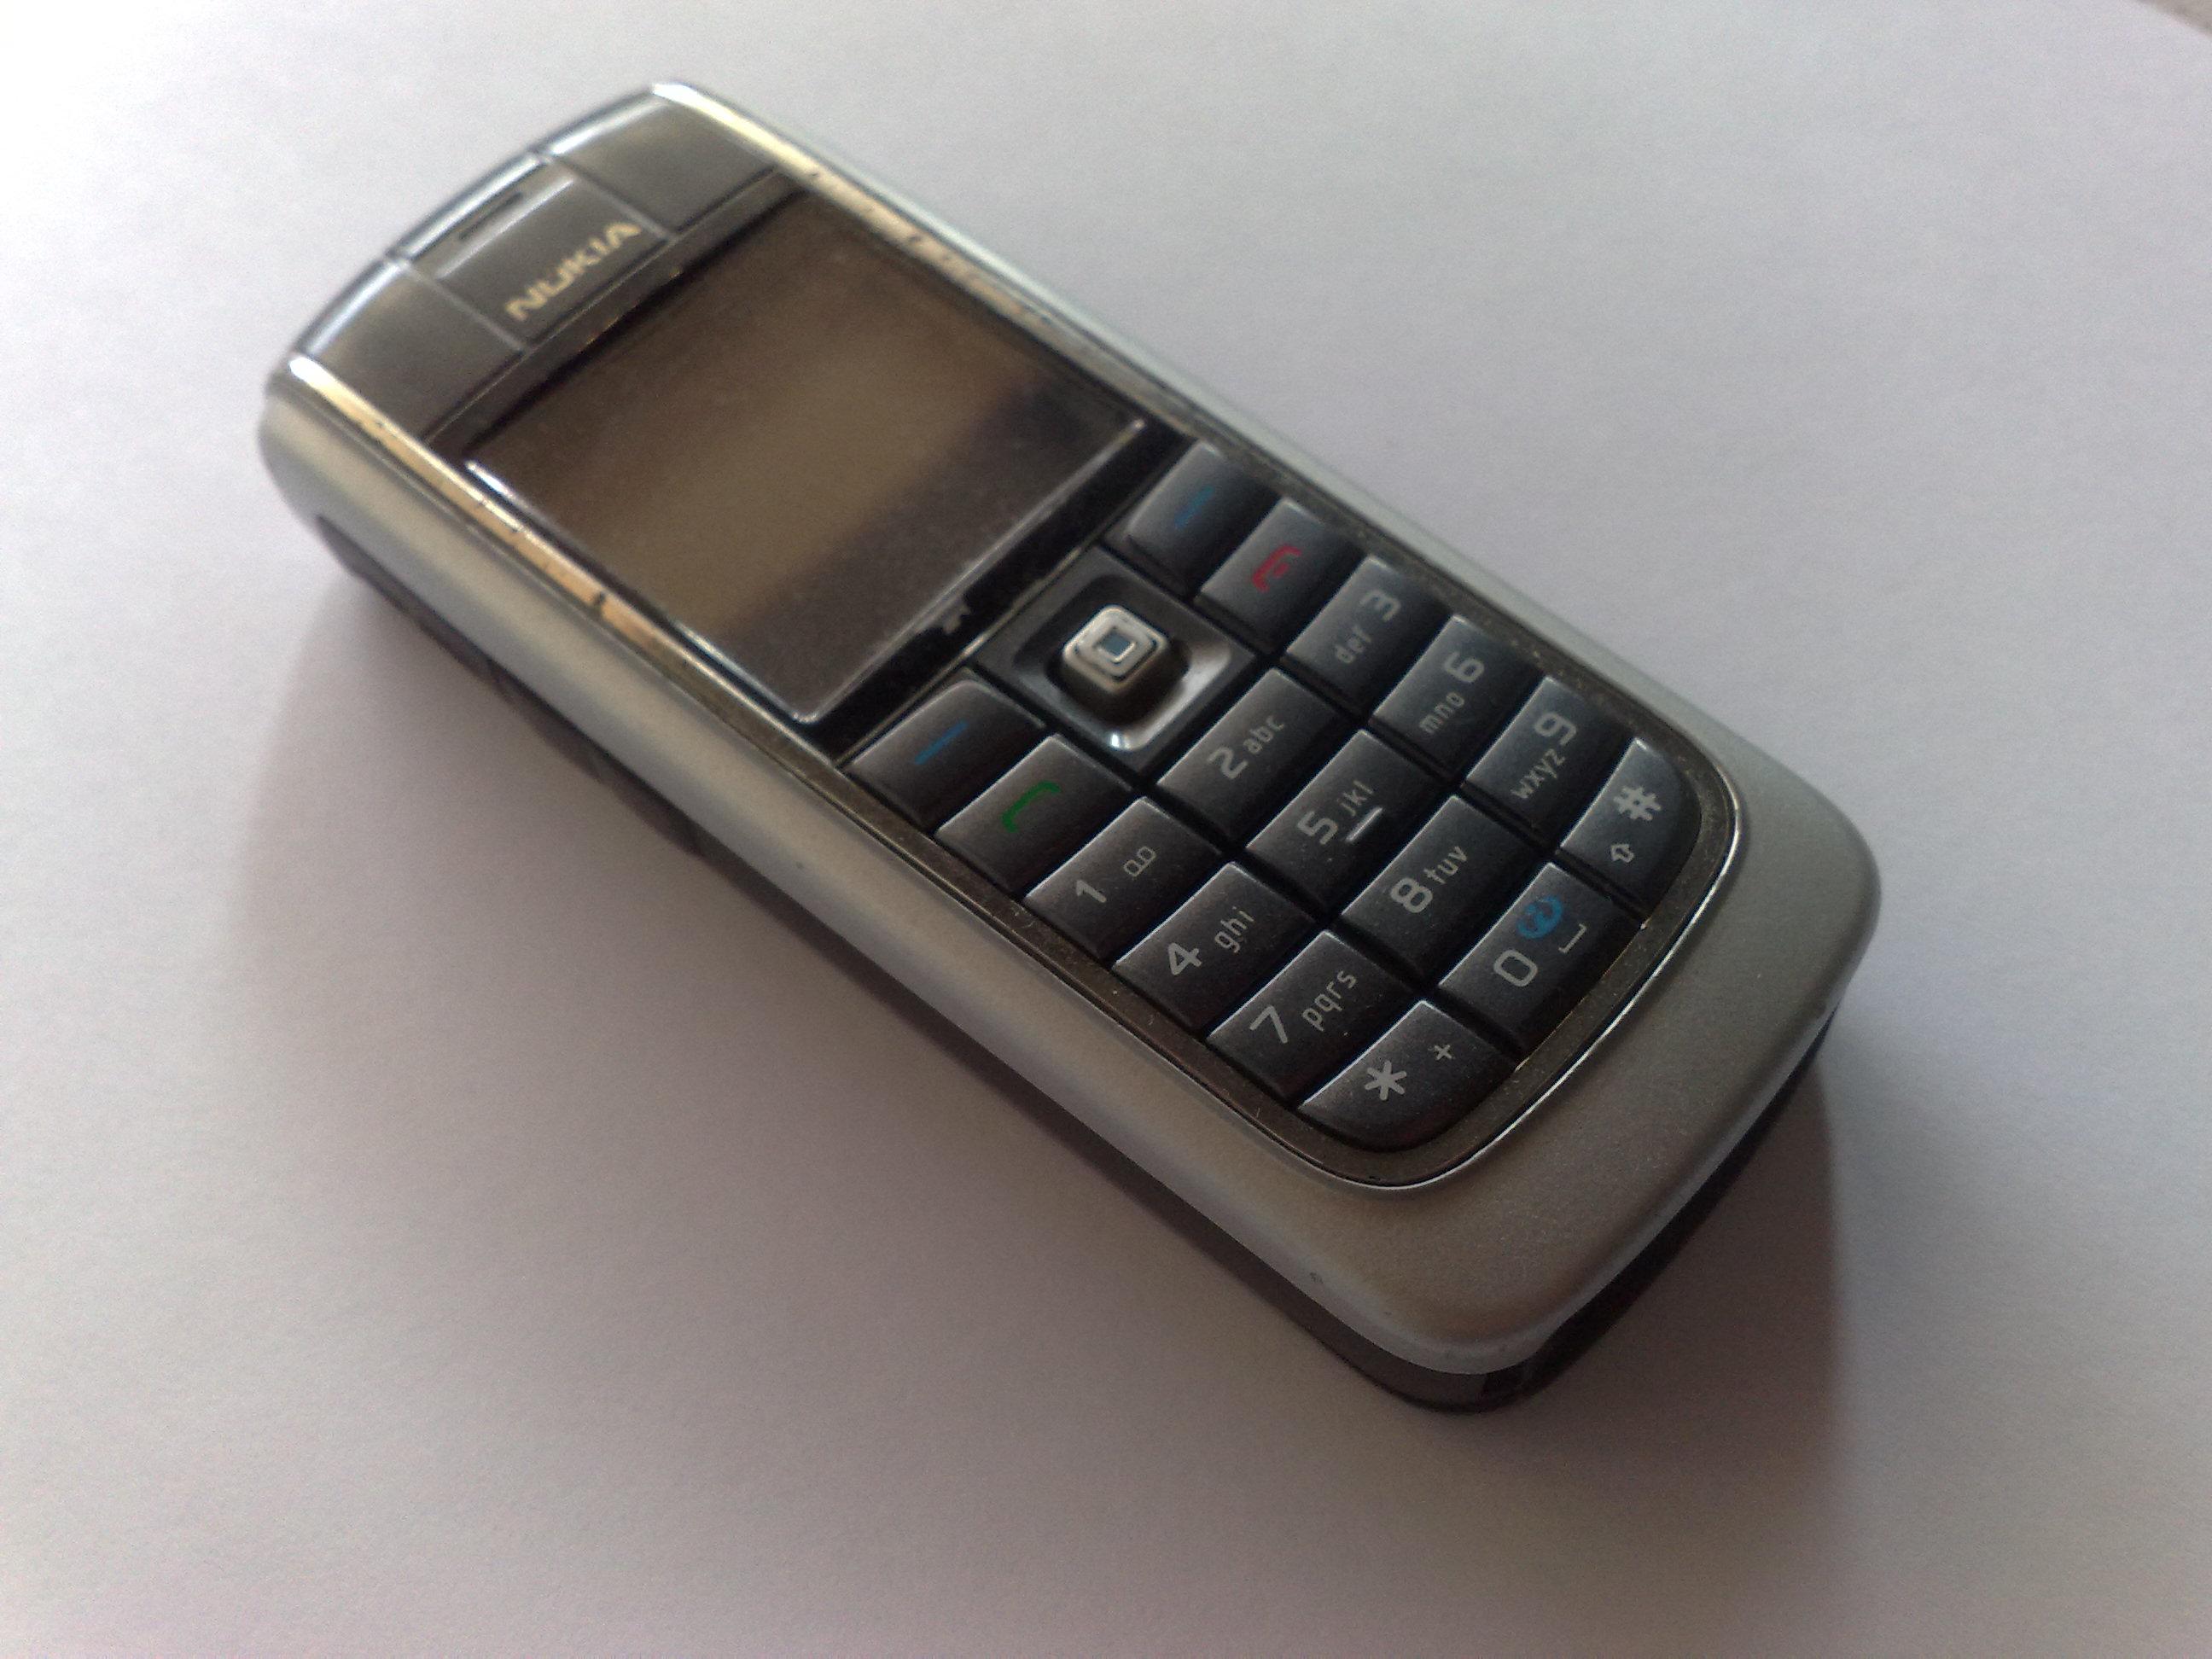 Драйвер Nokia 6020 Pc Suite Winxp Windows Vista